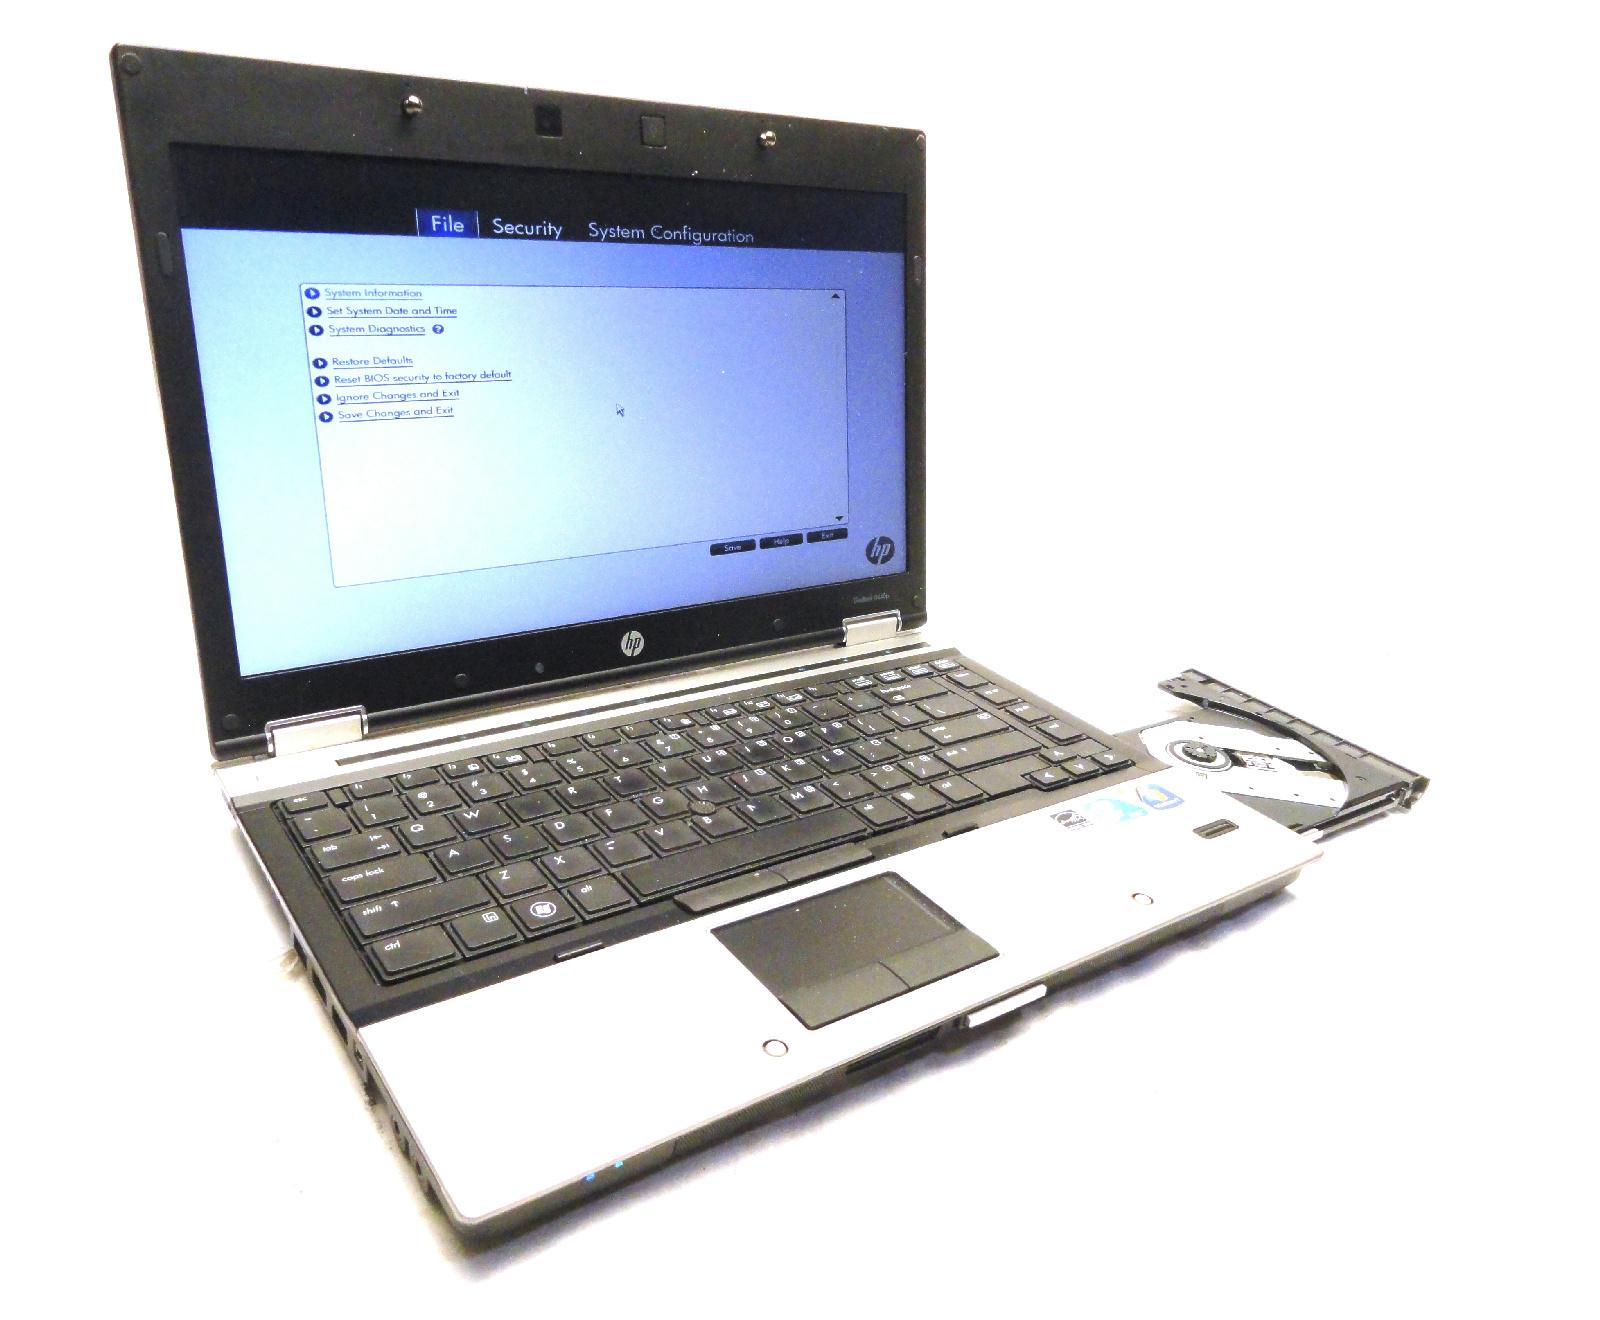 Hp elitebook 8440p i5 specs - Blank 4856